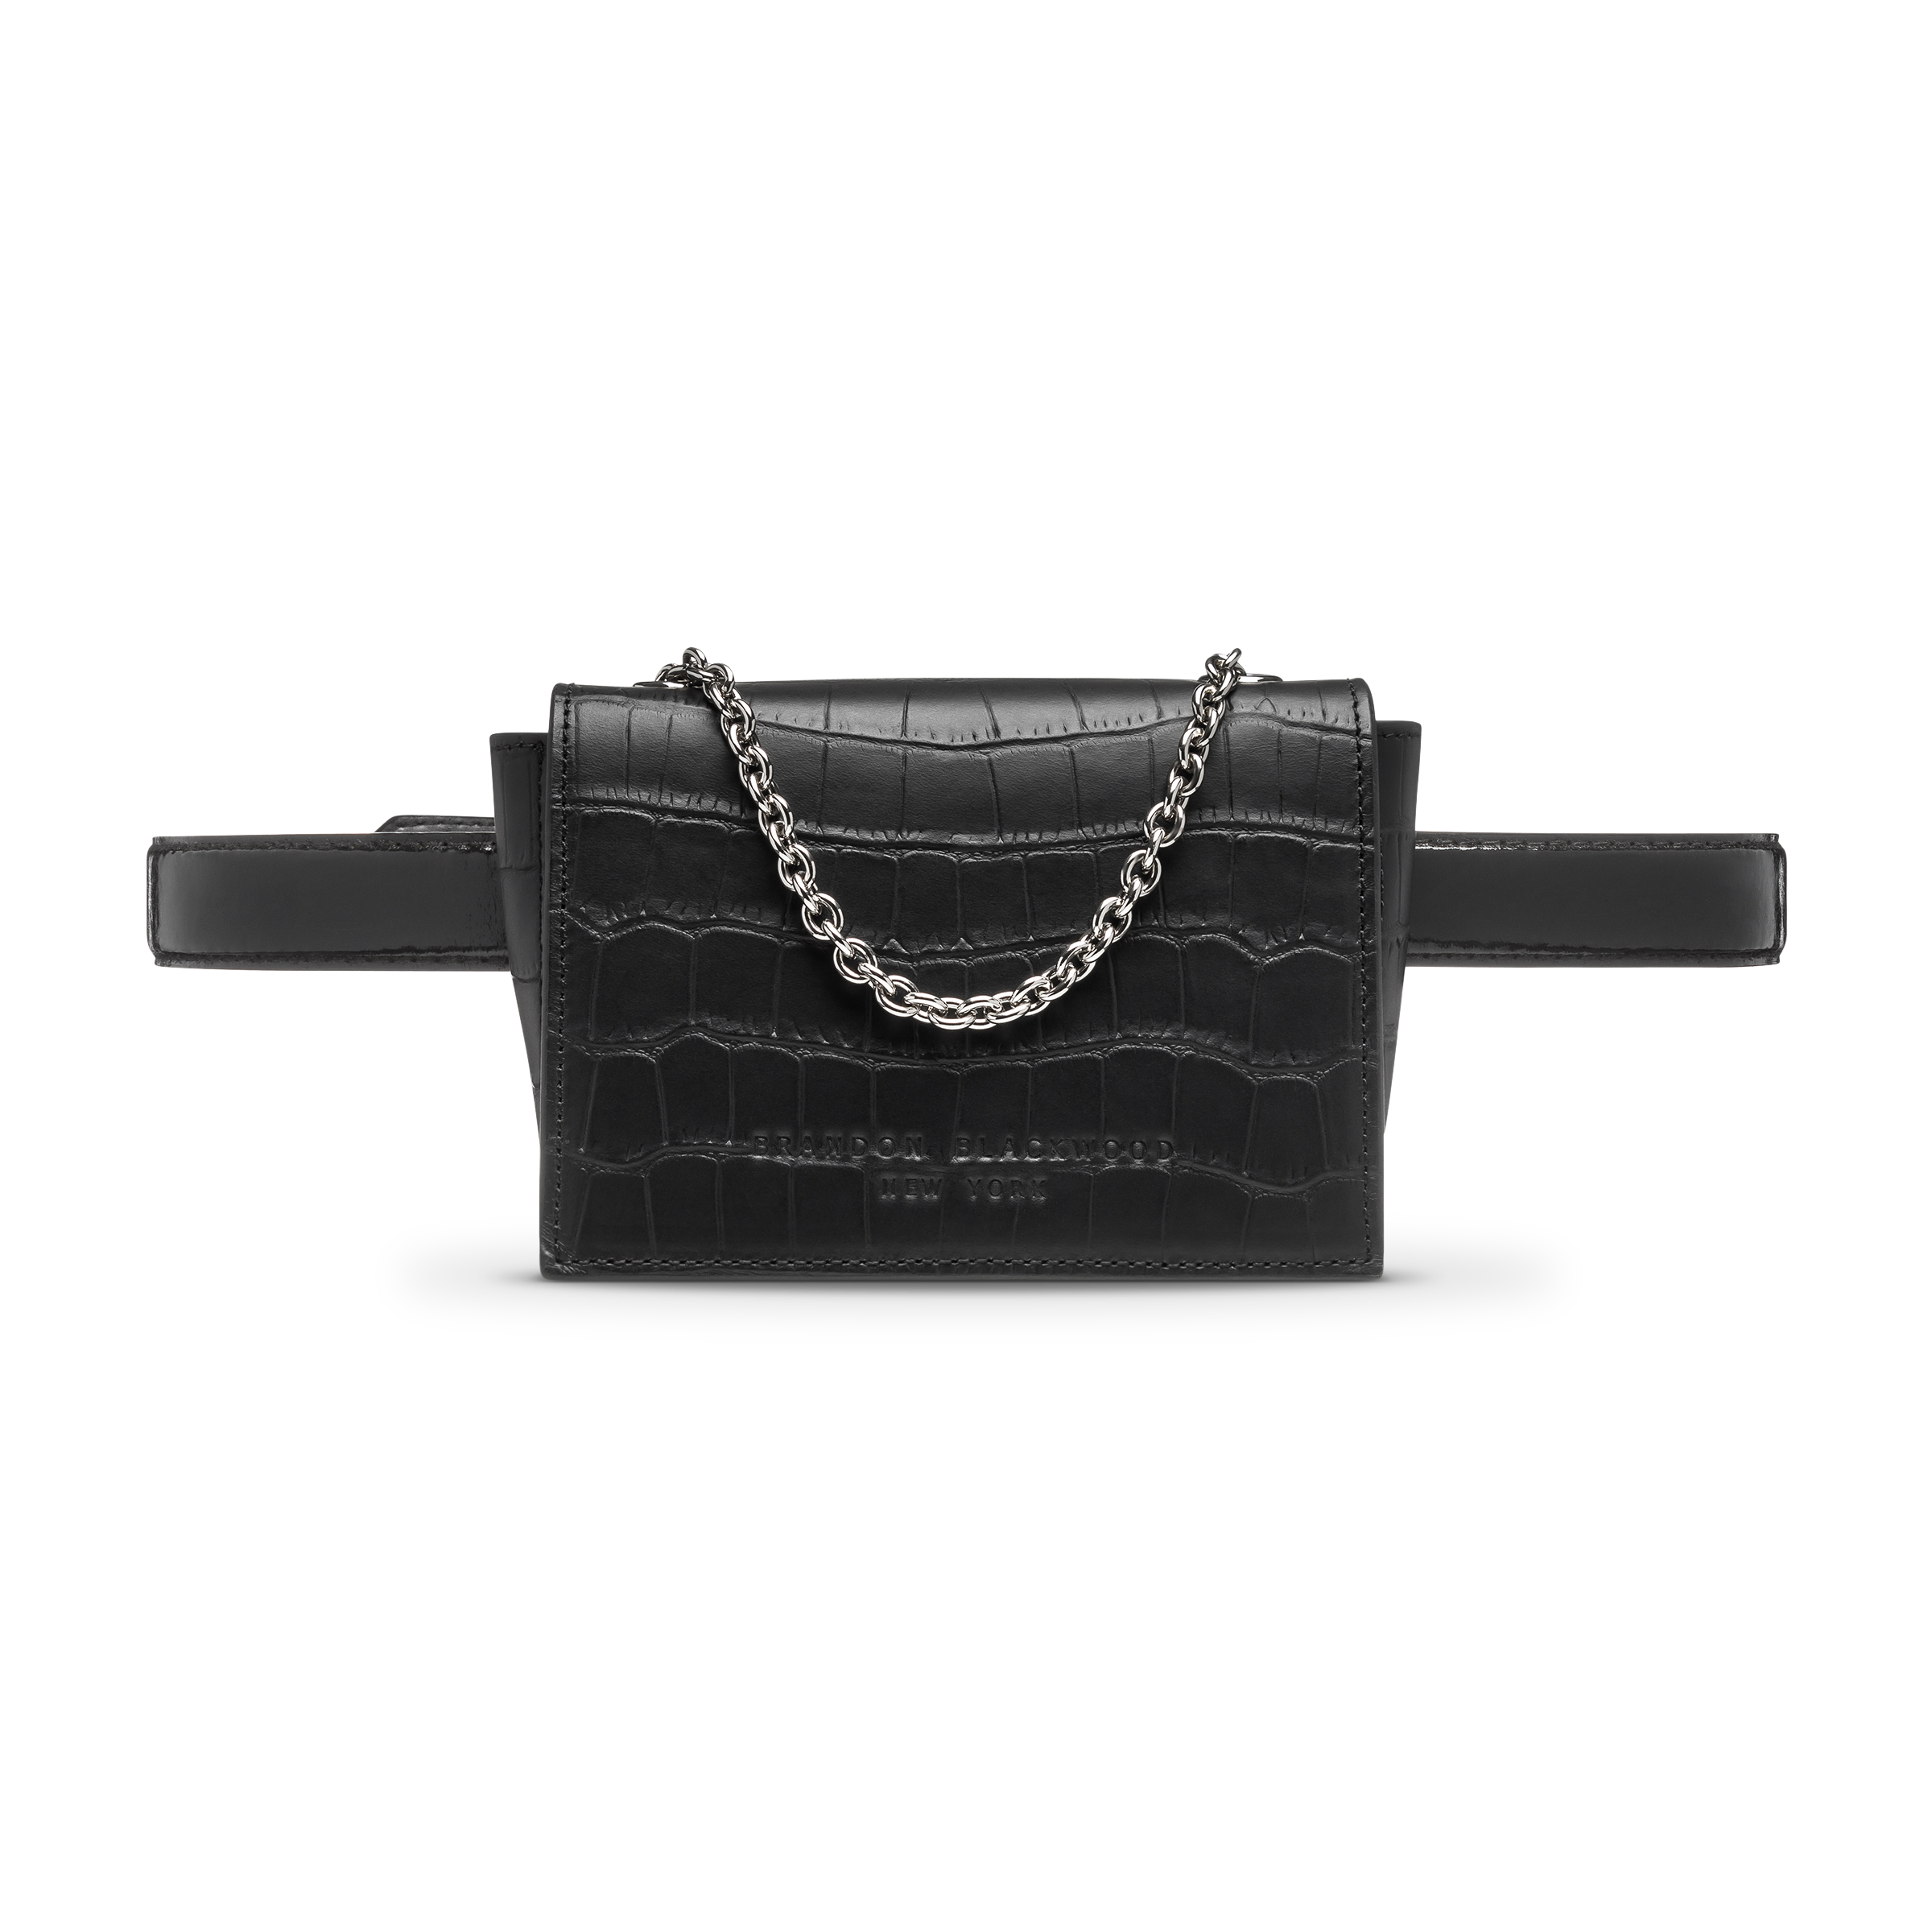 Black belt bag product photo